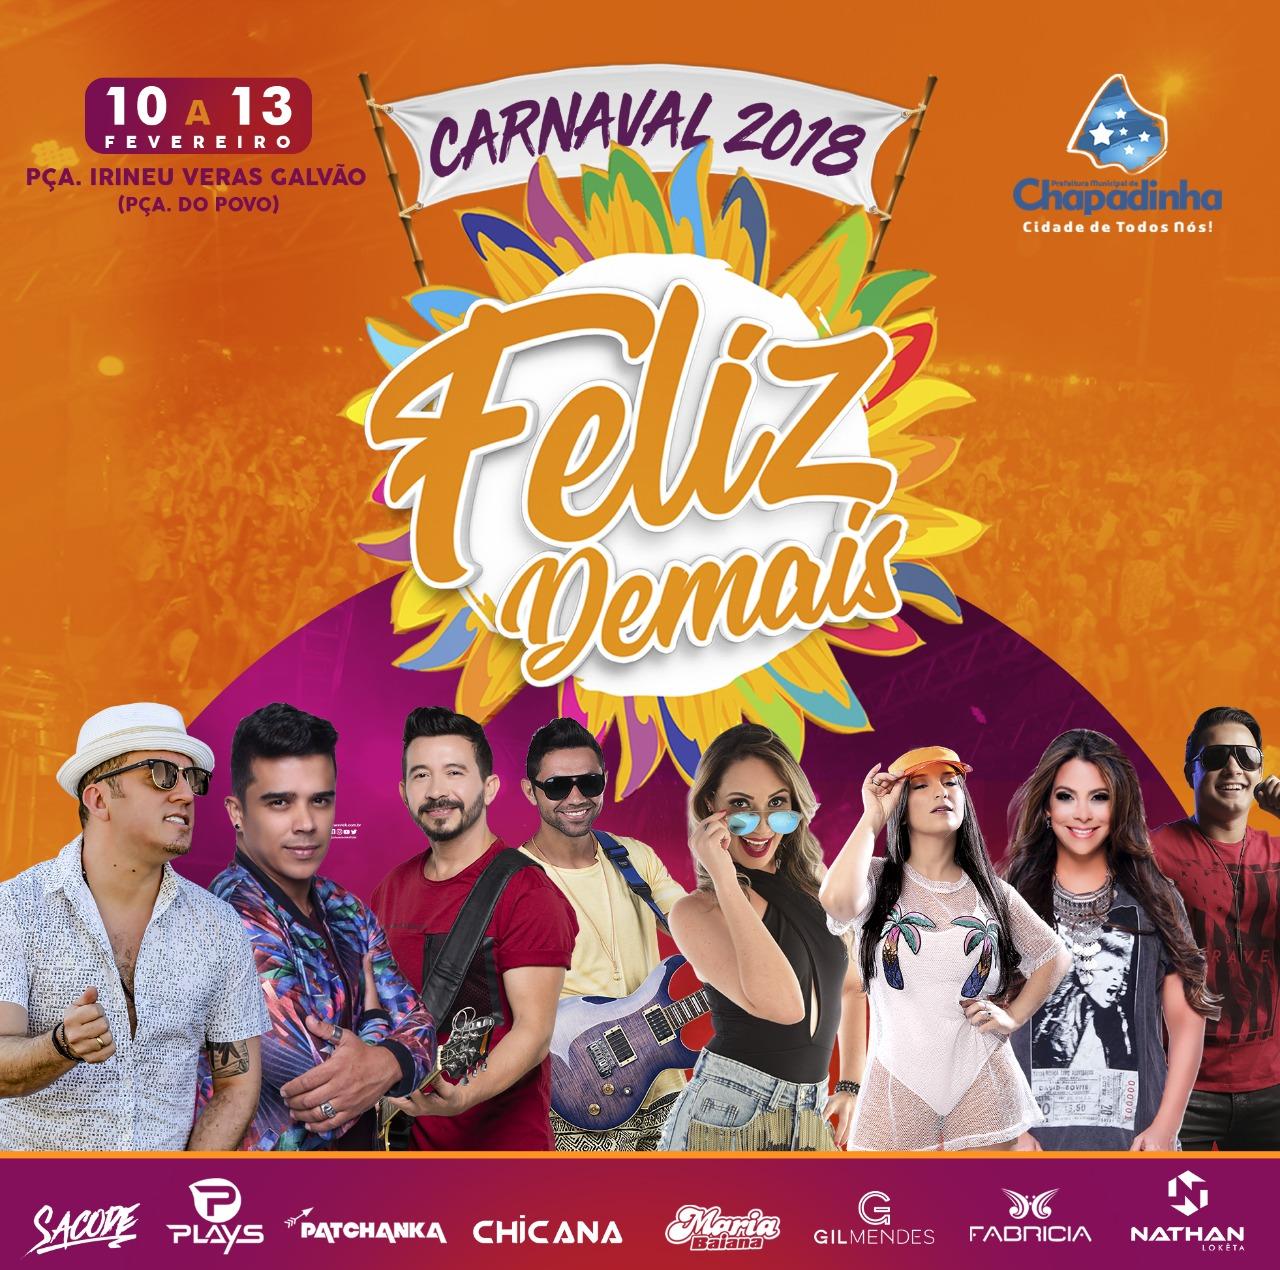 Carnaval Feliz Demais!